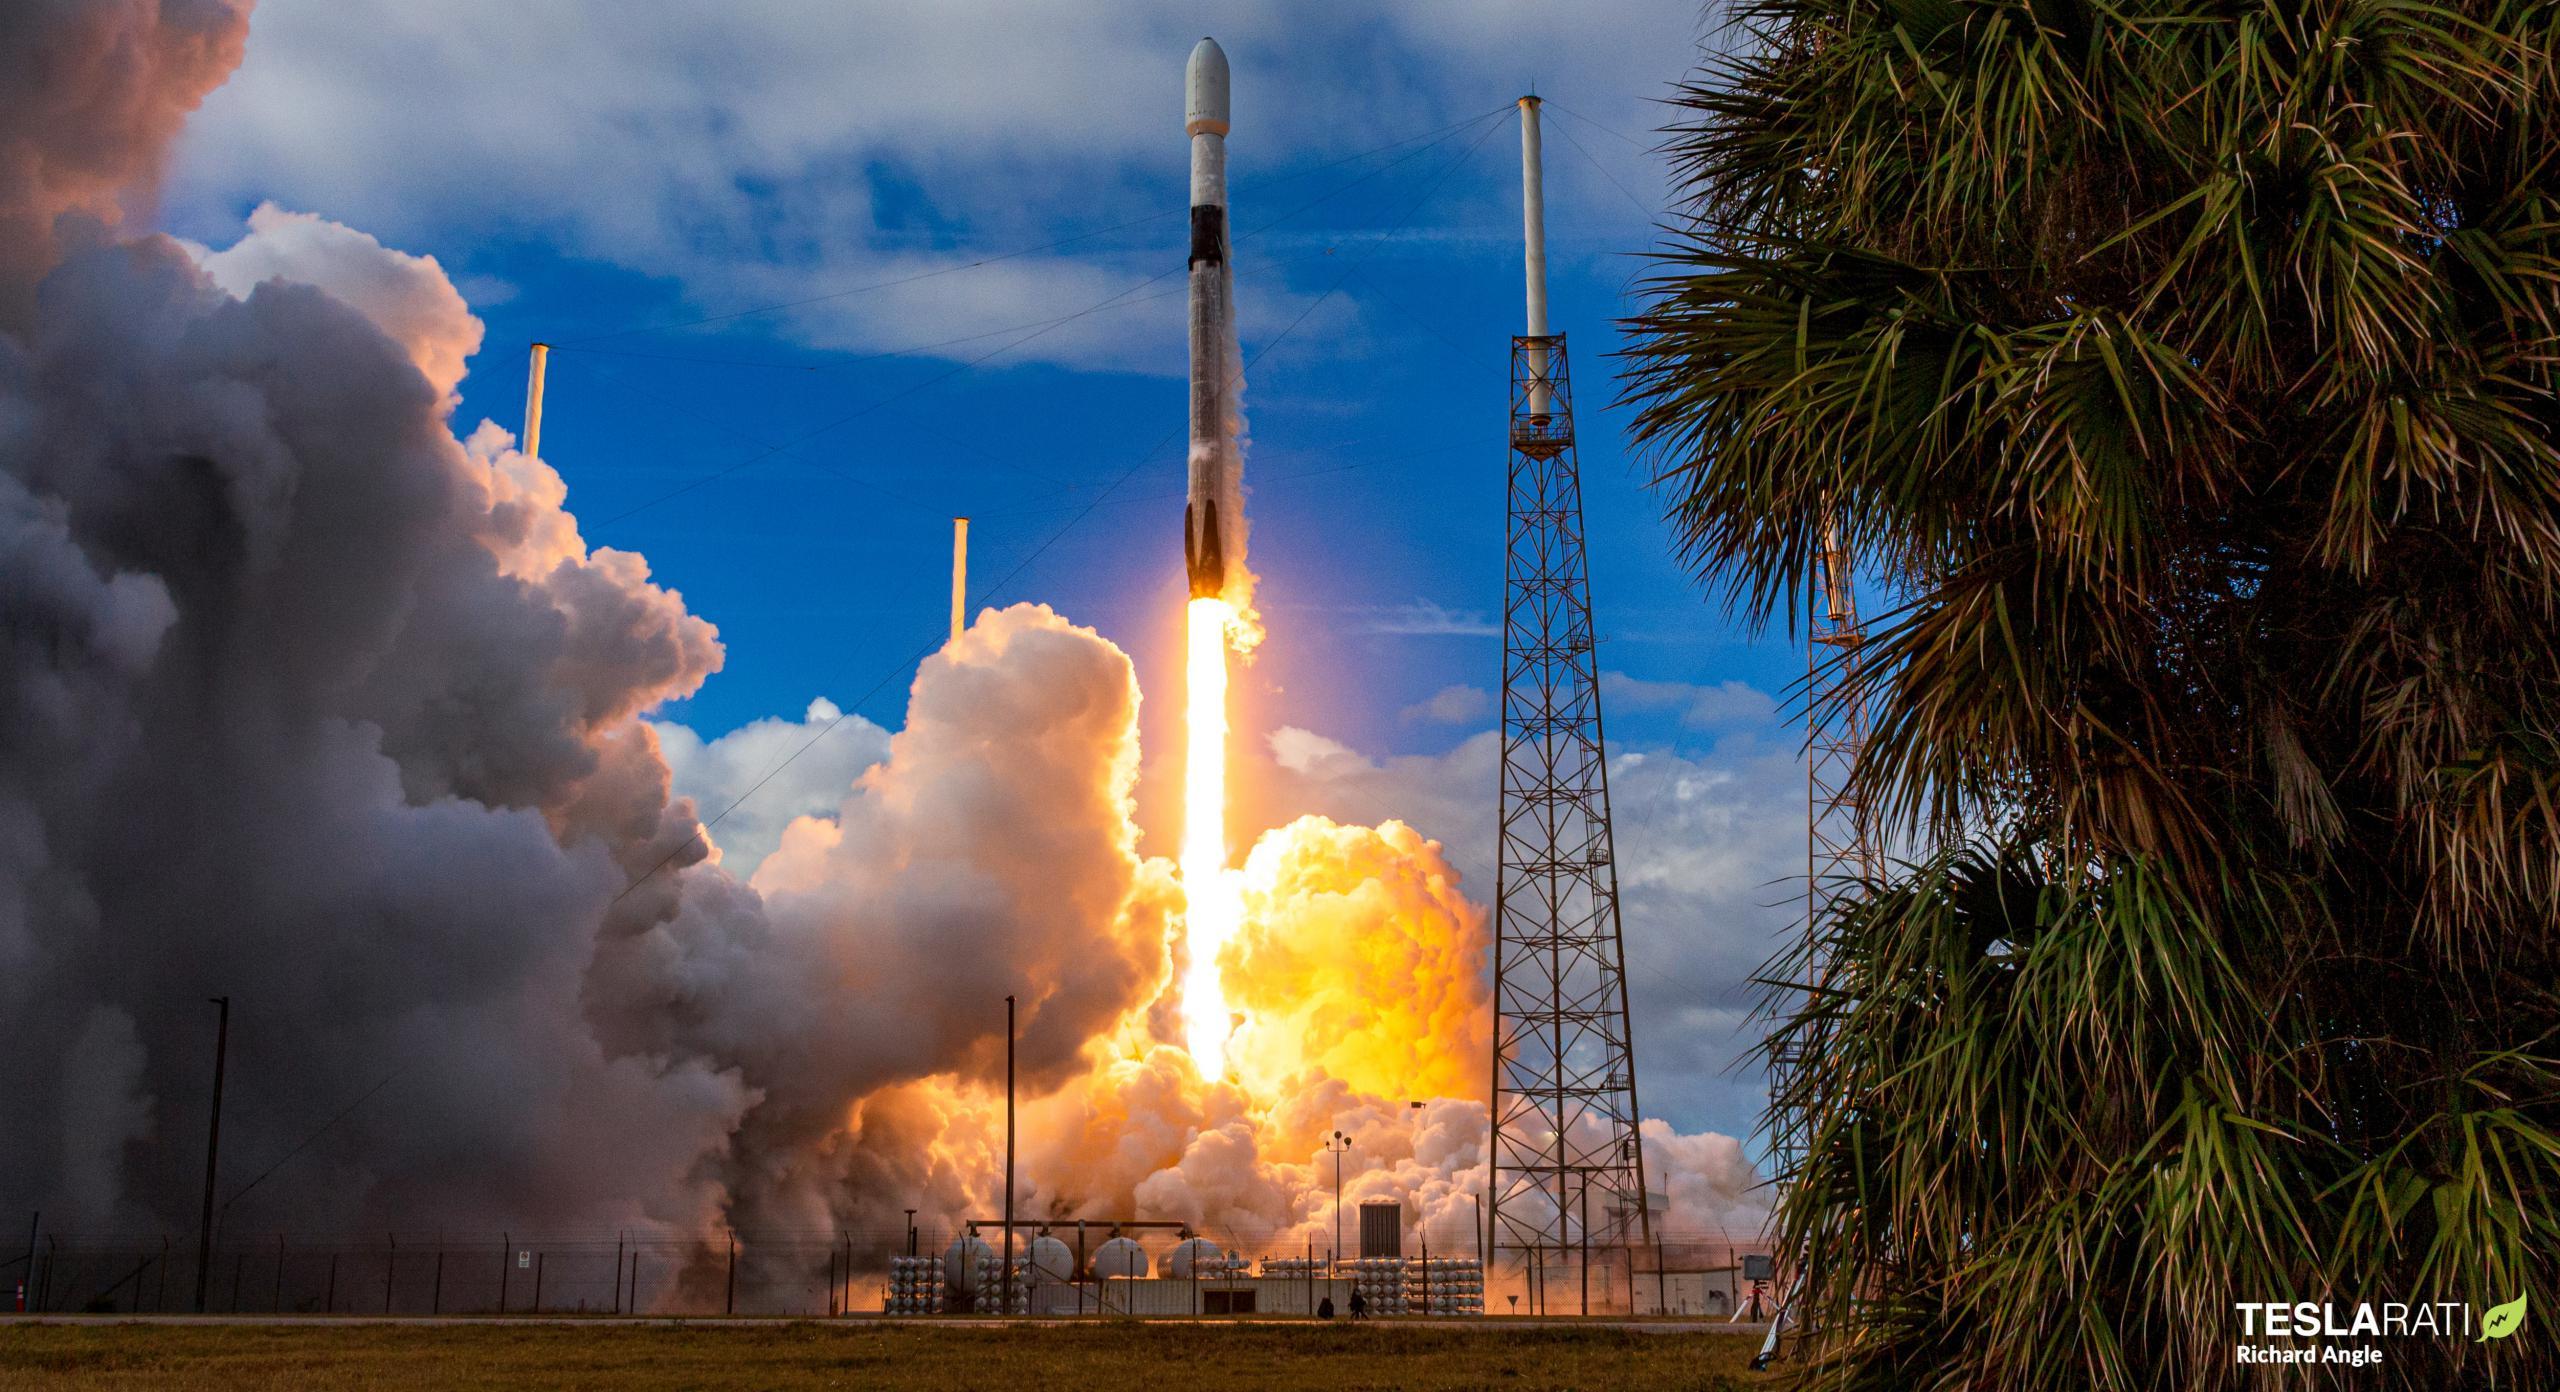 Transporter-1 Falcon 9 B1058 LC-40 012421 (Richard Angle) launch 5 crop (c)